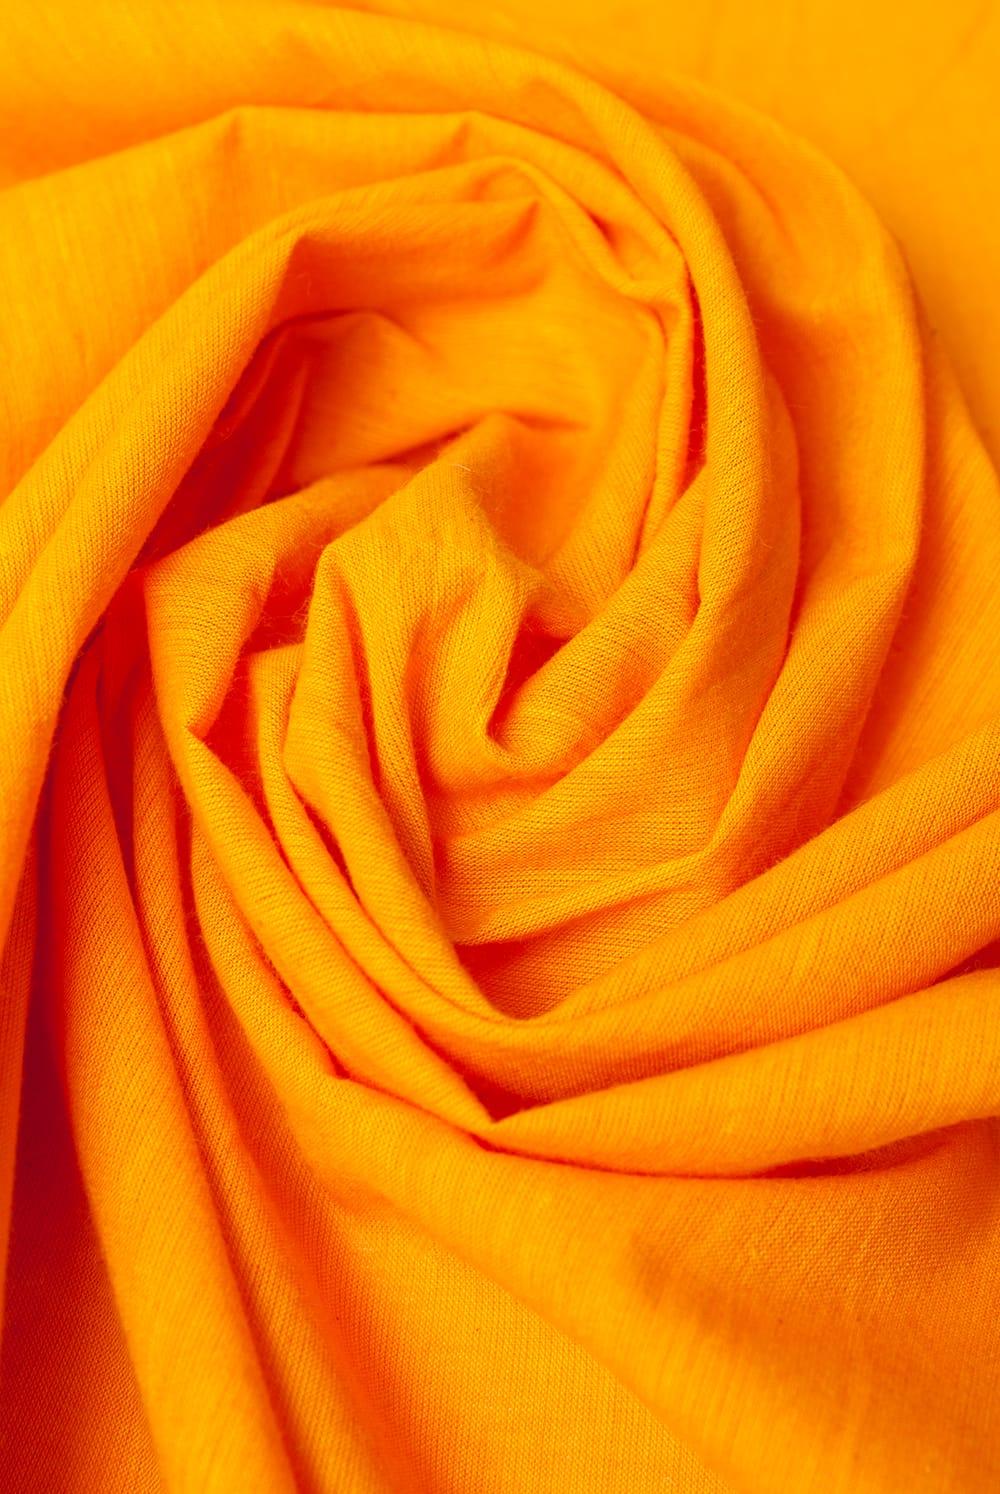 〔1m切り売り〕インドのシンプルコットン布  - オレンジイエロー〔幅約113cm〕 4 - 陰影をつけるととても素敵な色合いですね。